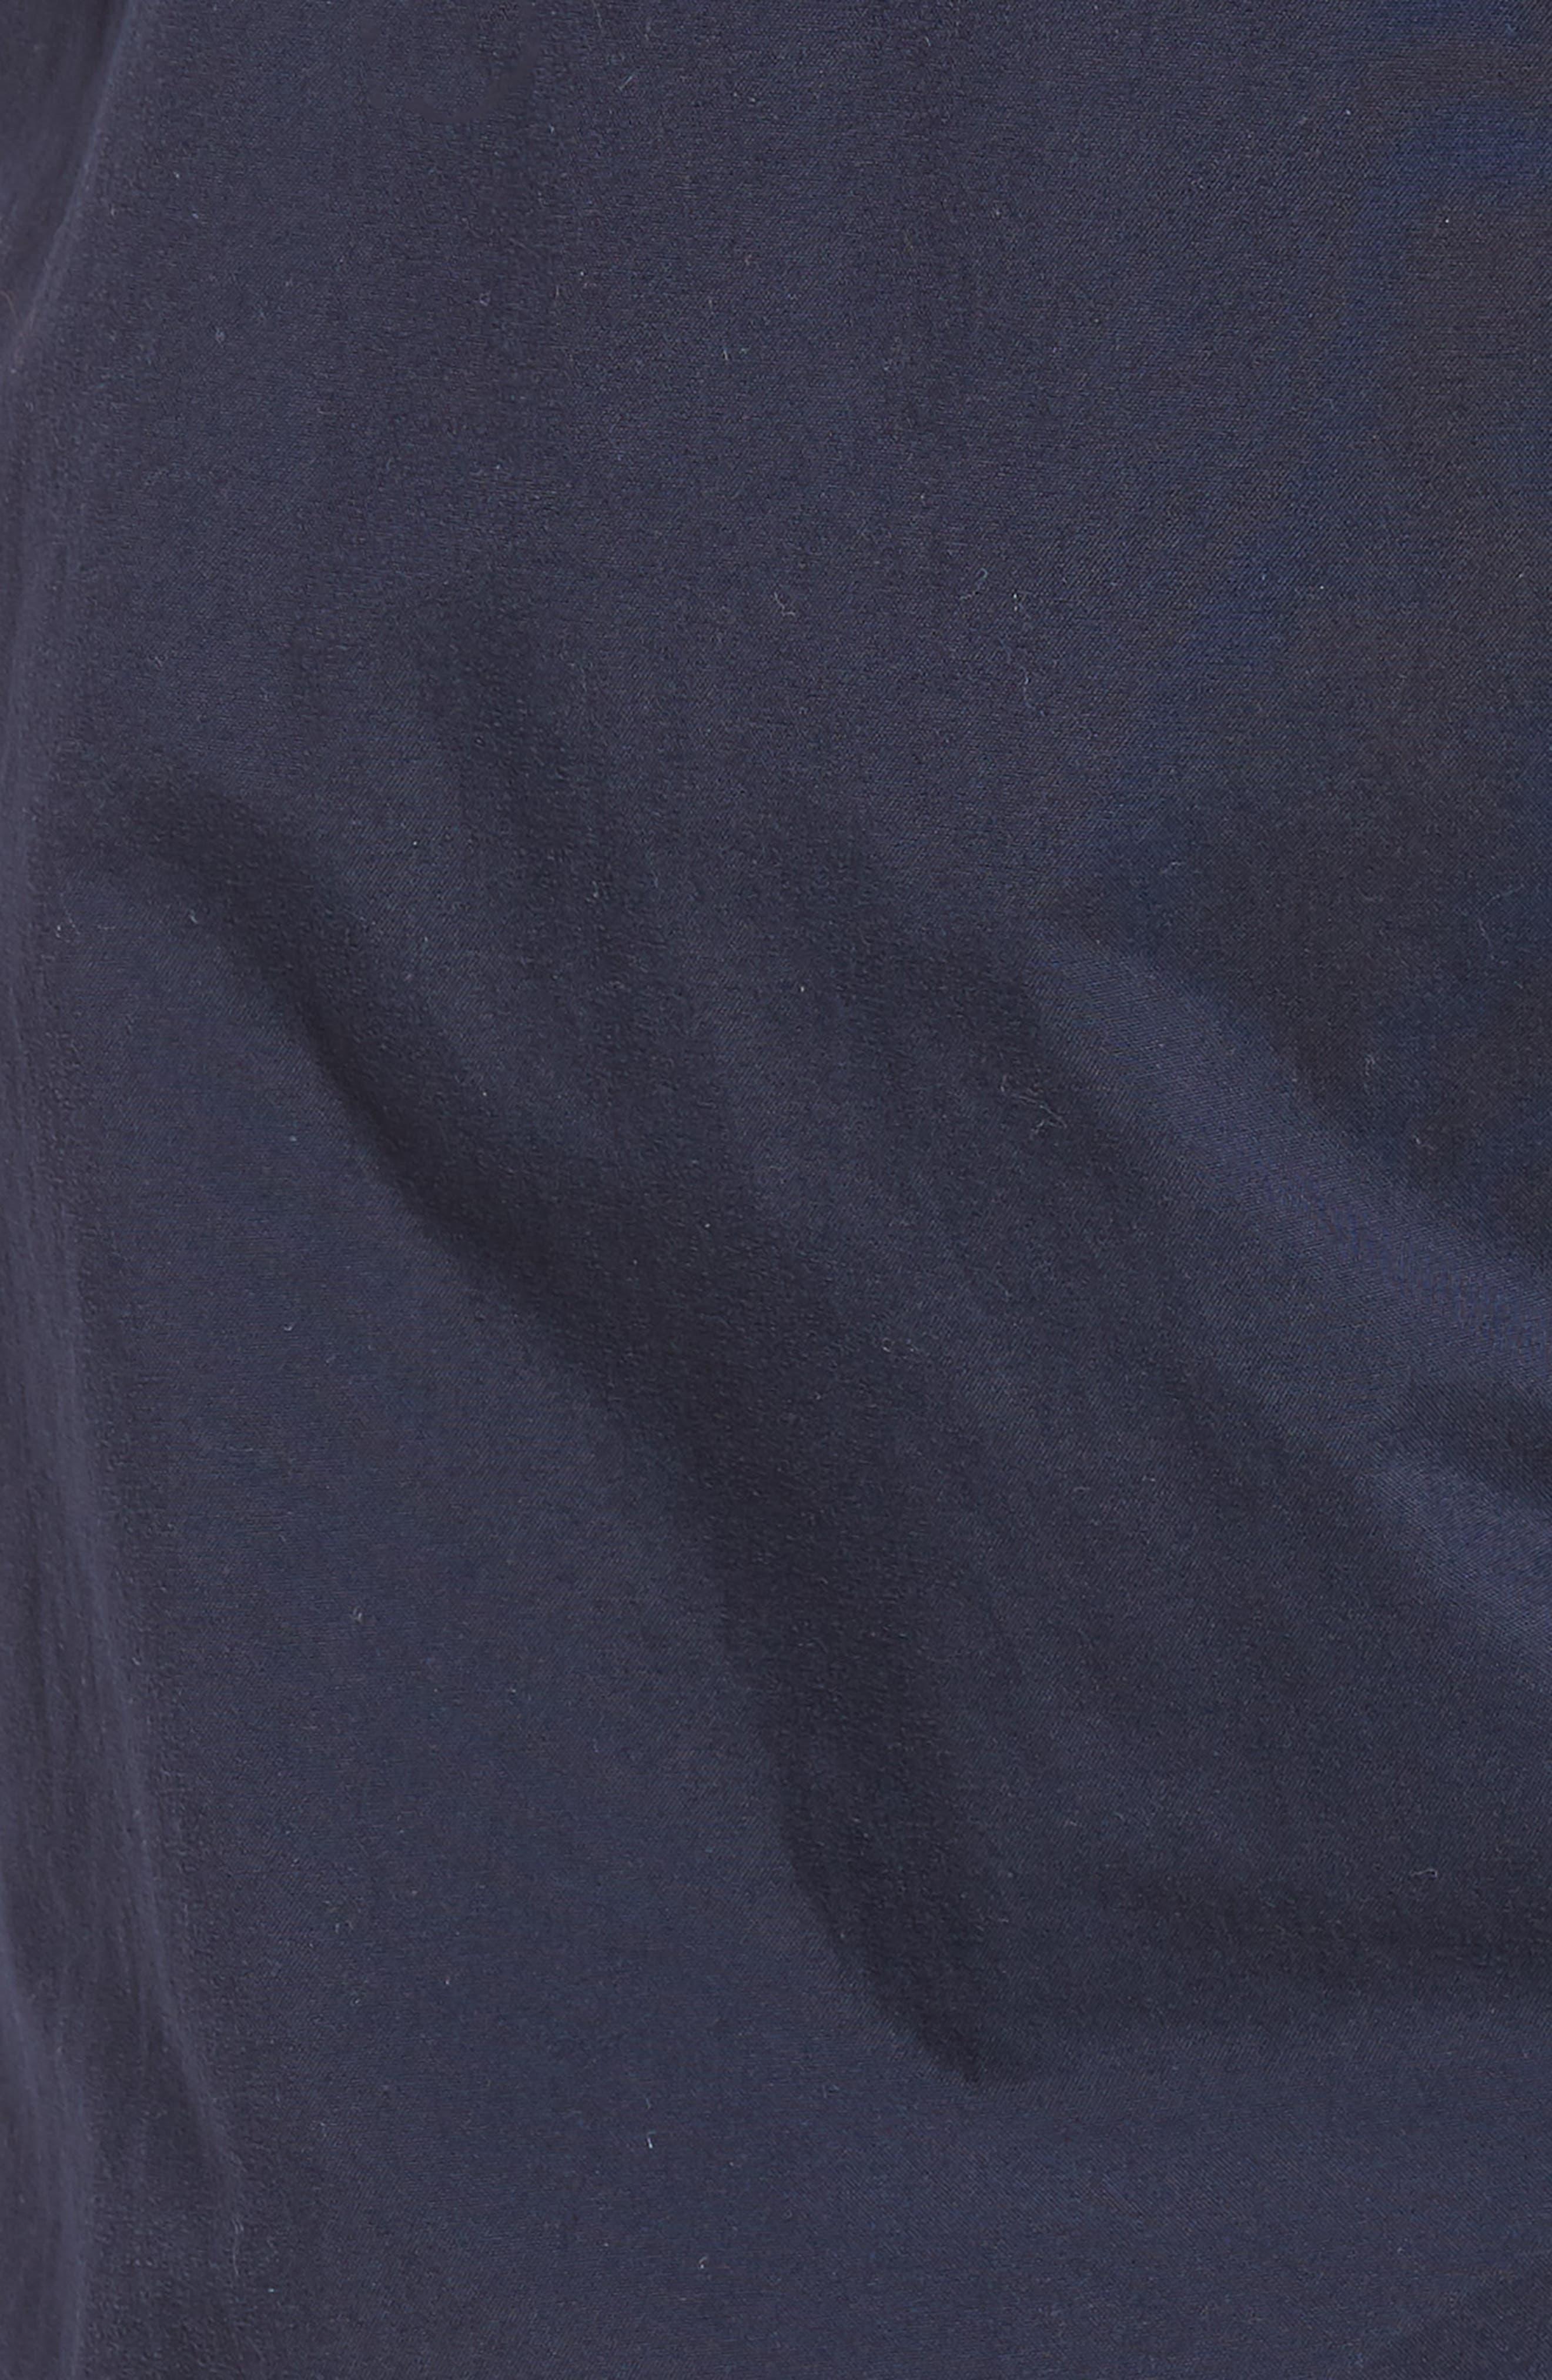 Perch Swim Trunks,                             Alternate thumbnail 3, color,                             Blue